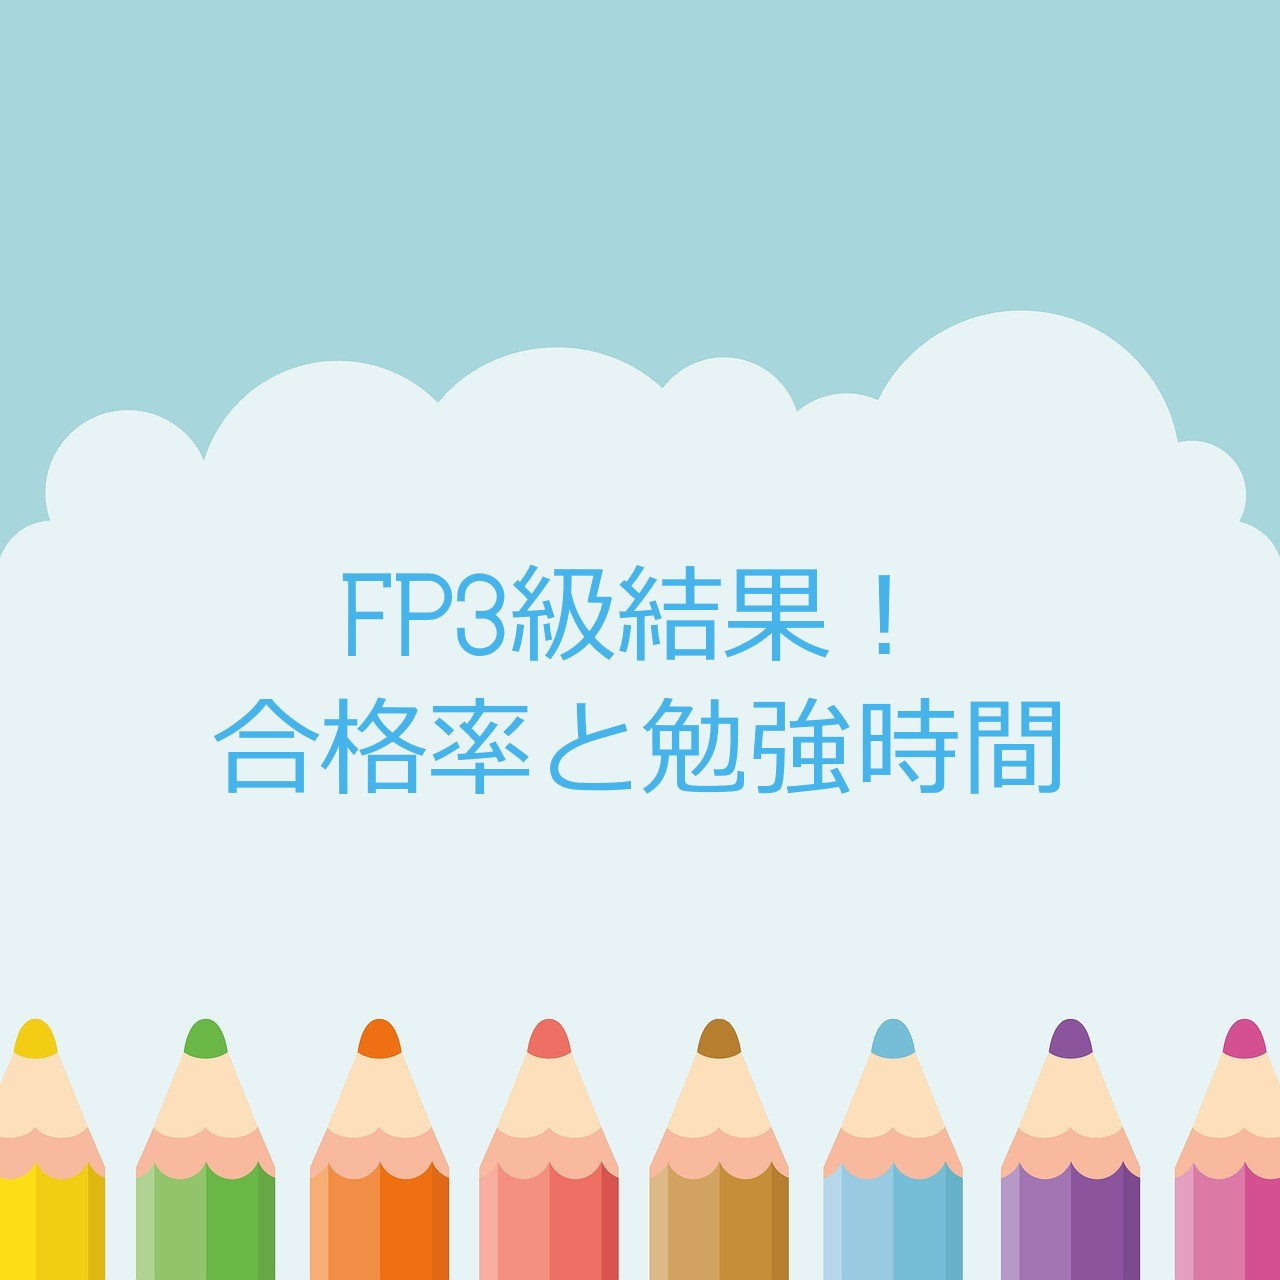 FP3級結果!合格率と勉強時間